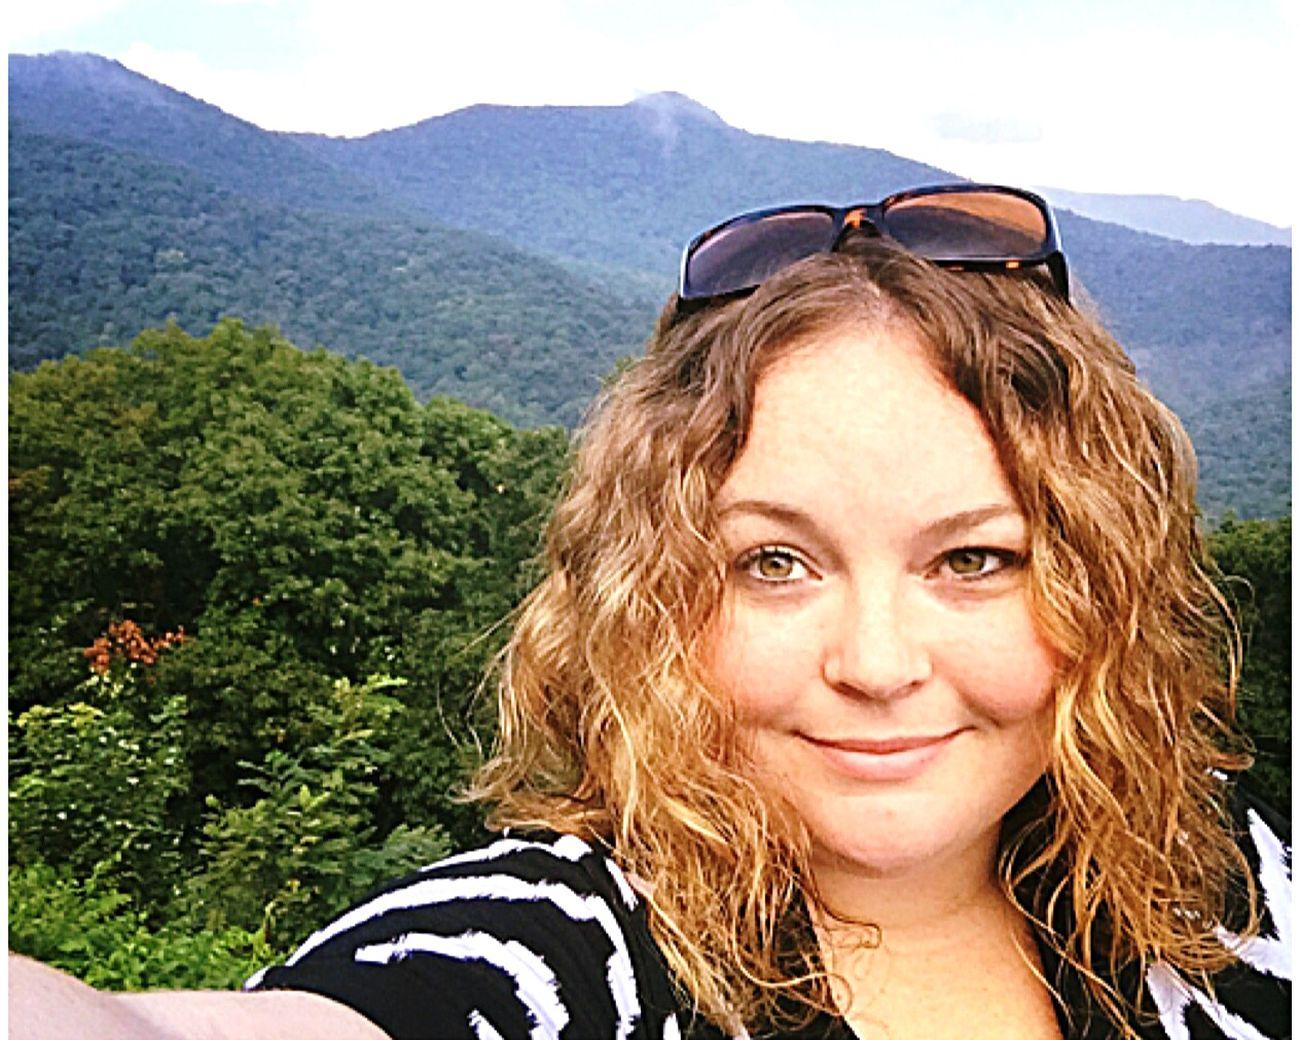 North Carolina Mountain View Mount Mitchell Selfportrait That's Me Hello World Beautiful EyeEm Best Shots Enjoying Life Hiking